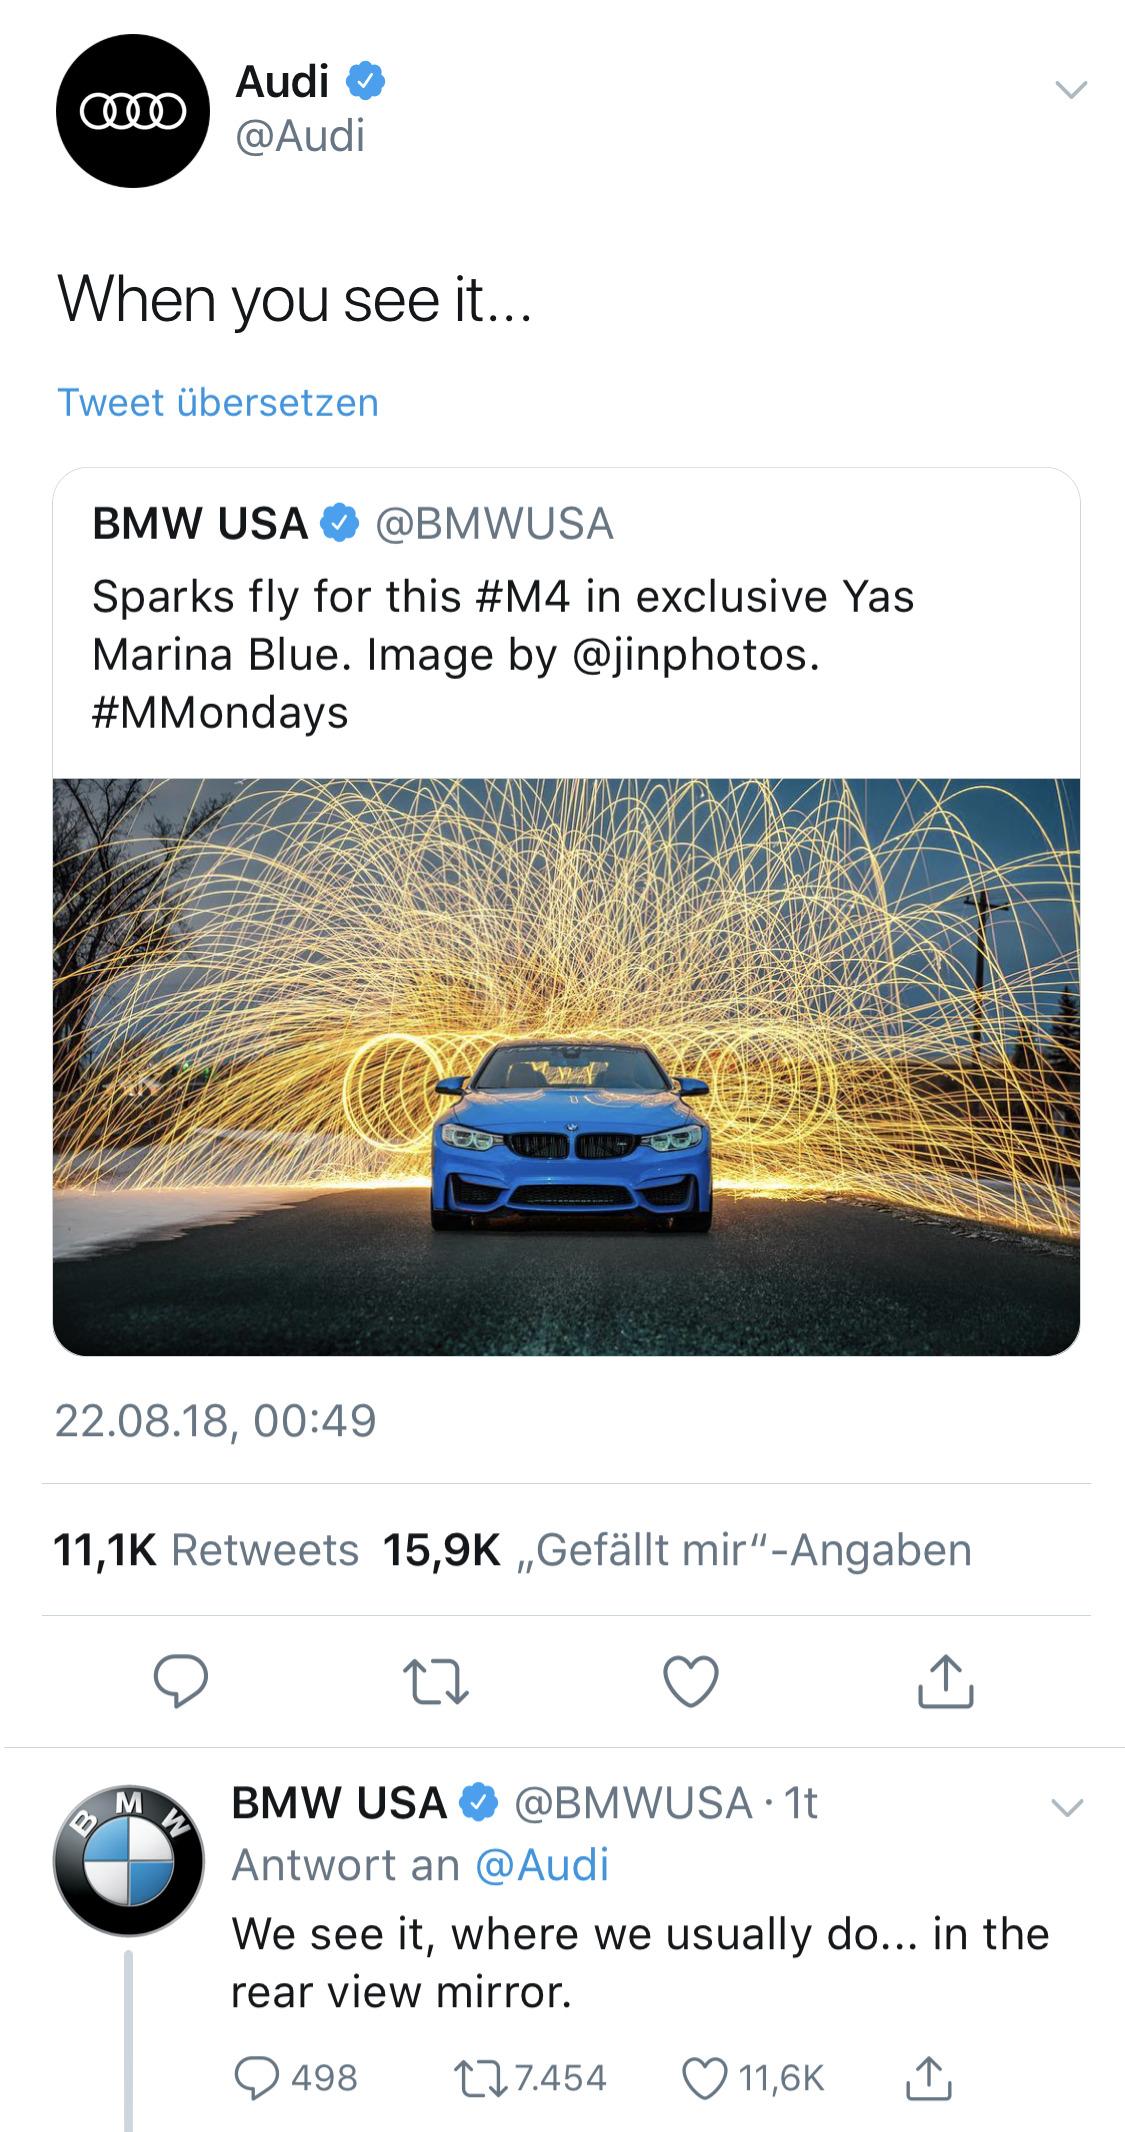 BMW vs Audi Twitter